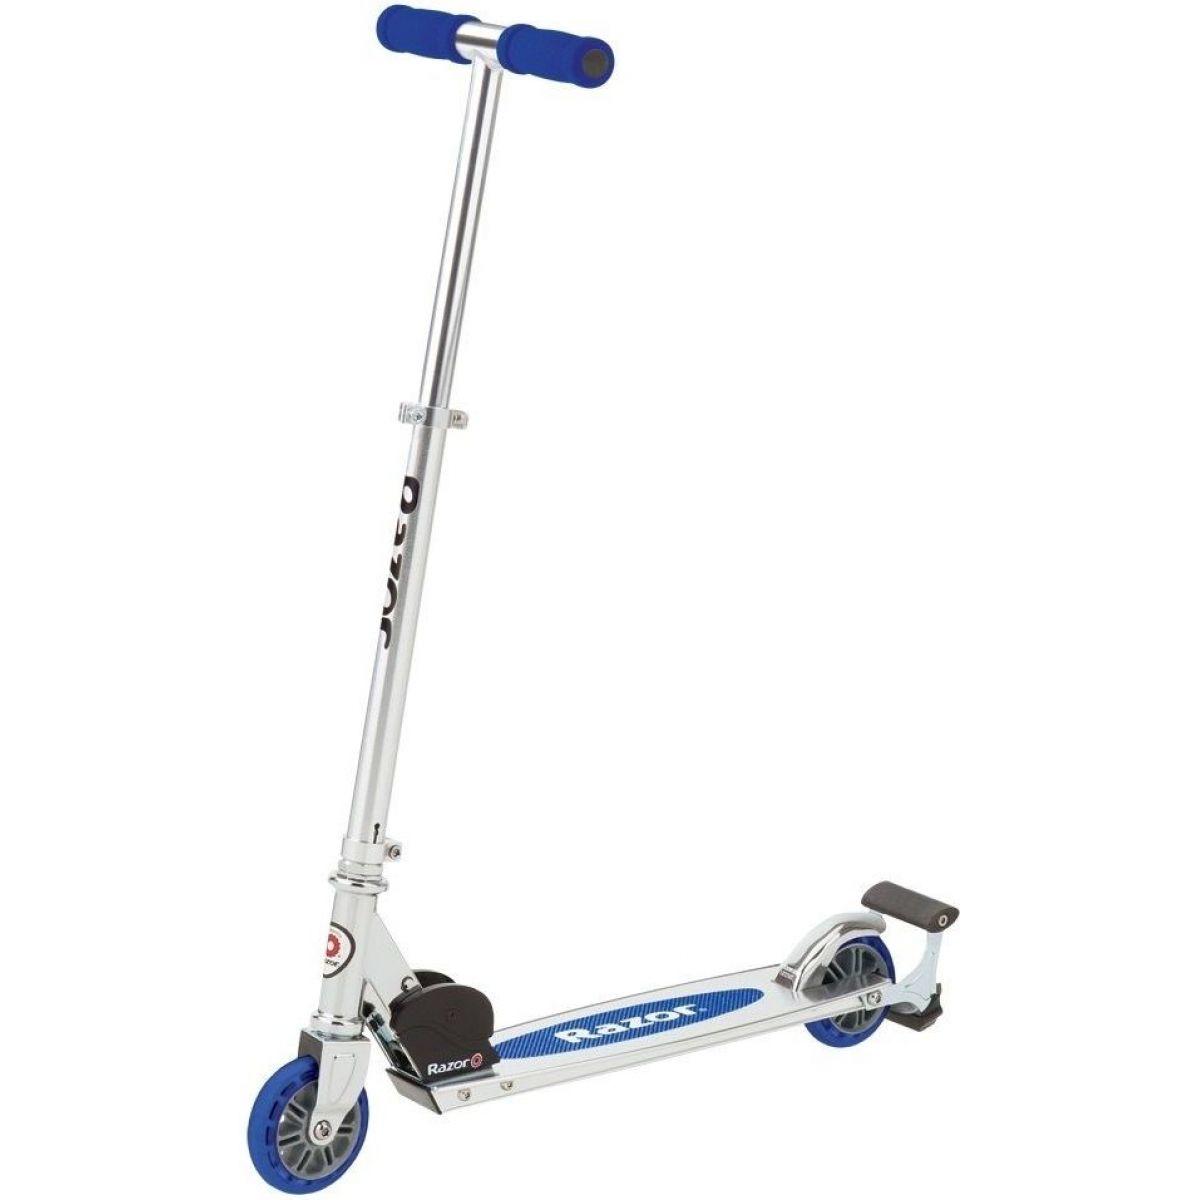 Razor Koloběžka Spark Scooter w 125 mm wheels Blue